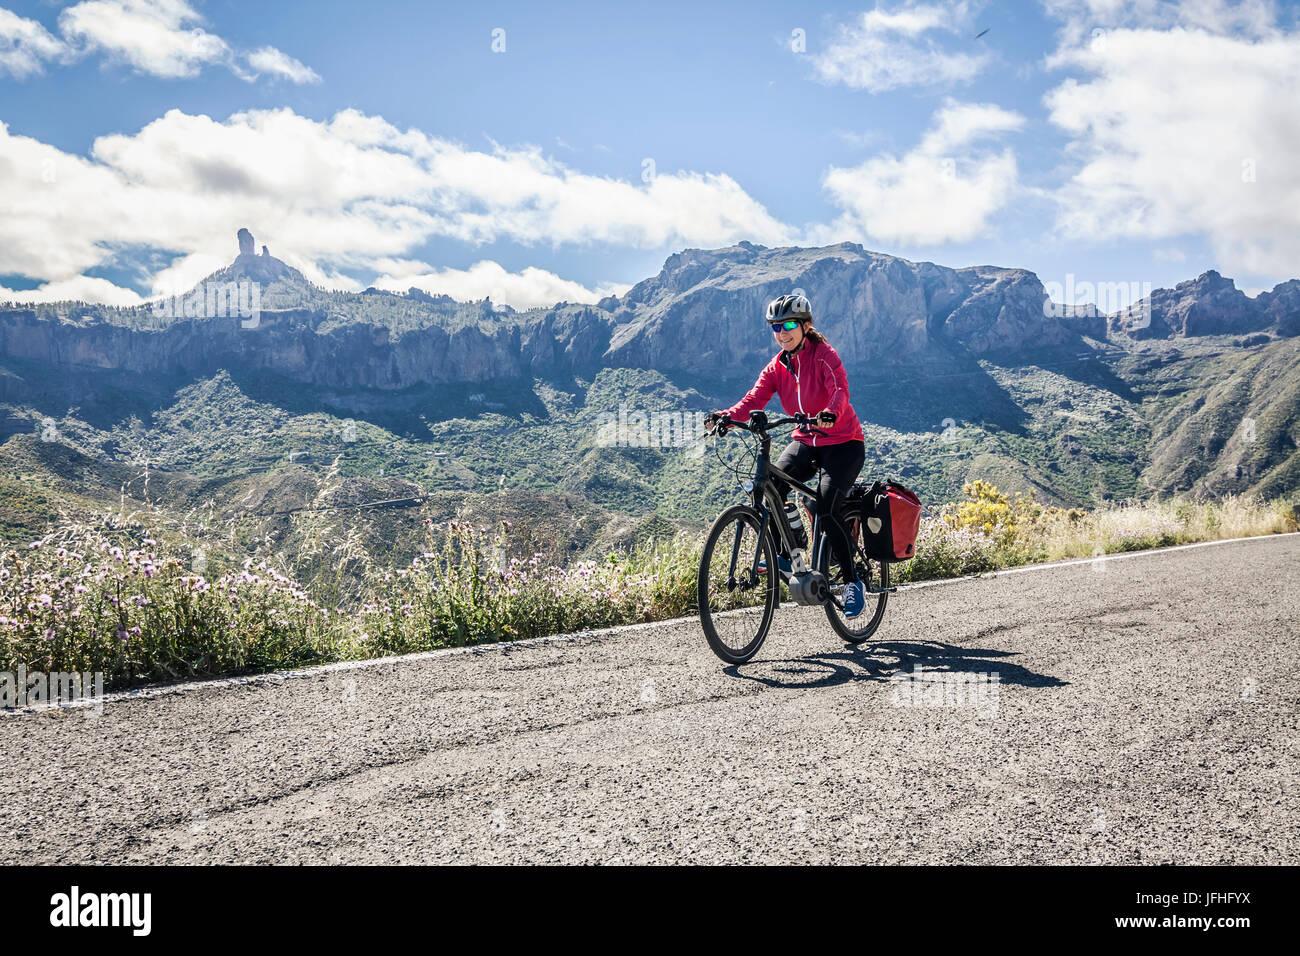 Frau Reiten-Elektro-Fahrrad auf Bergstraße Stockbild